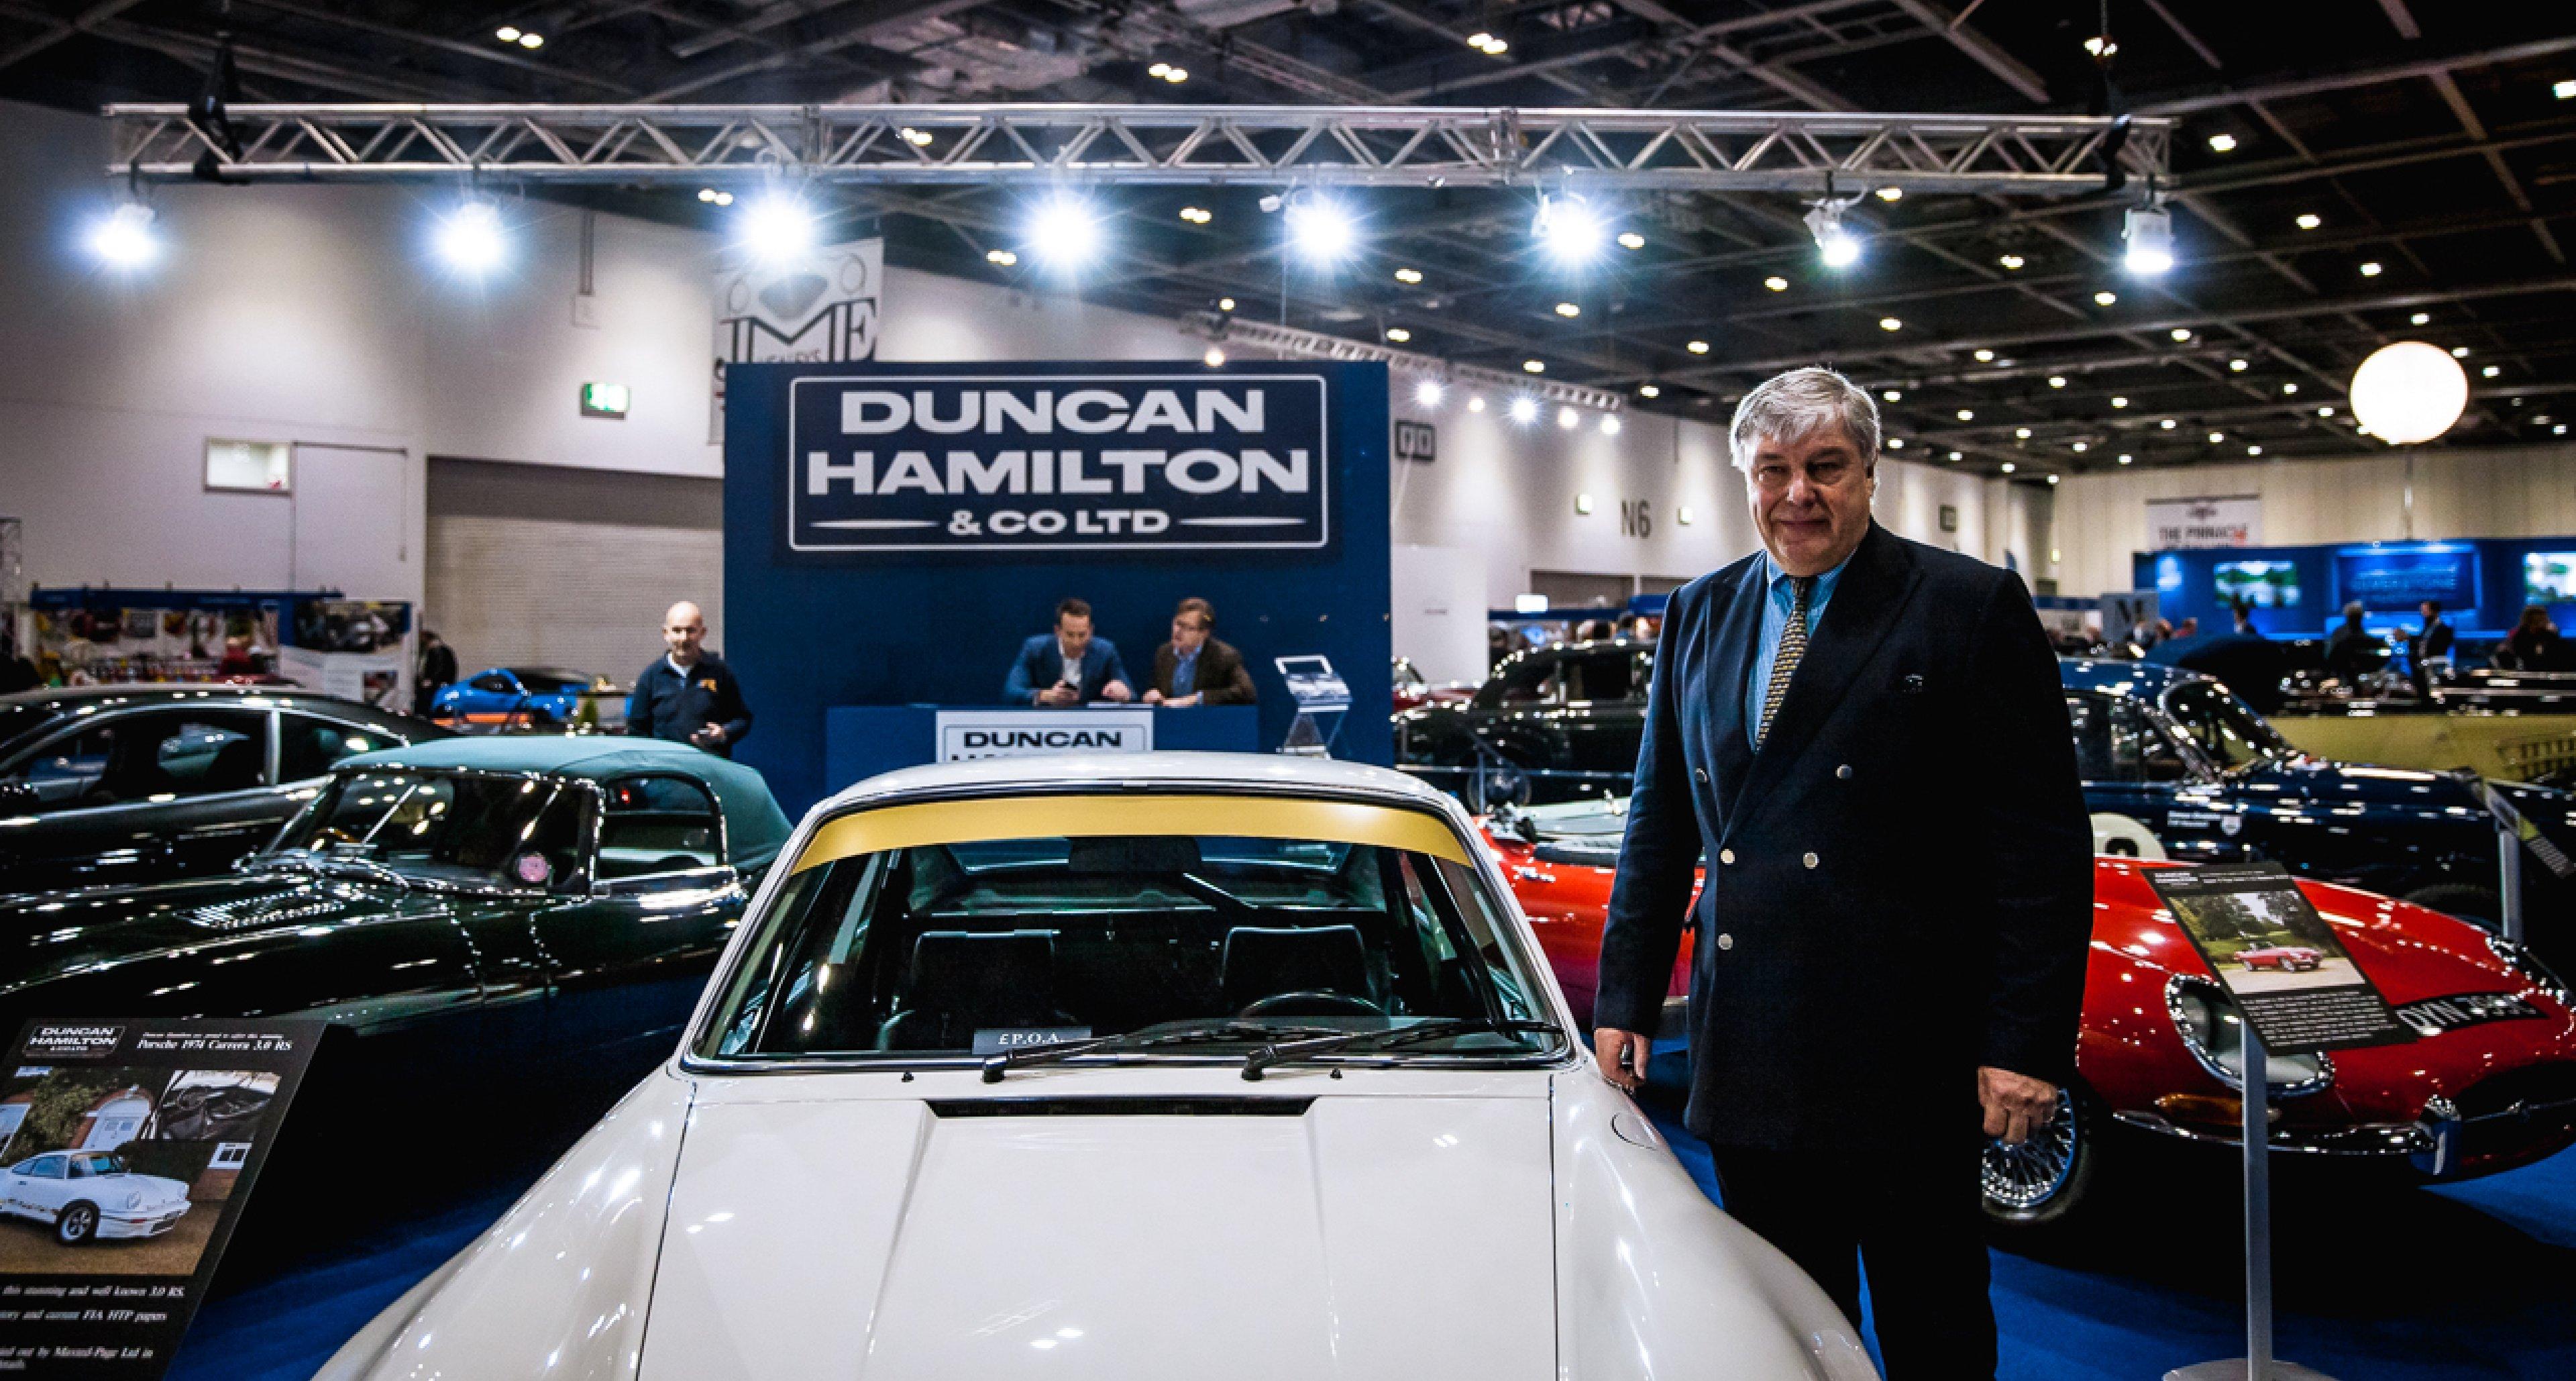 Adrian Hamilton of Duncan Hamilton & Co Ltd.